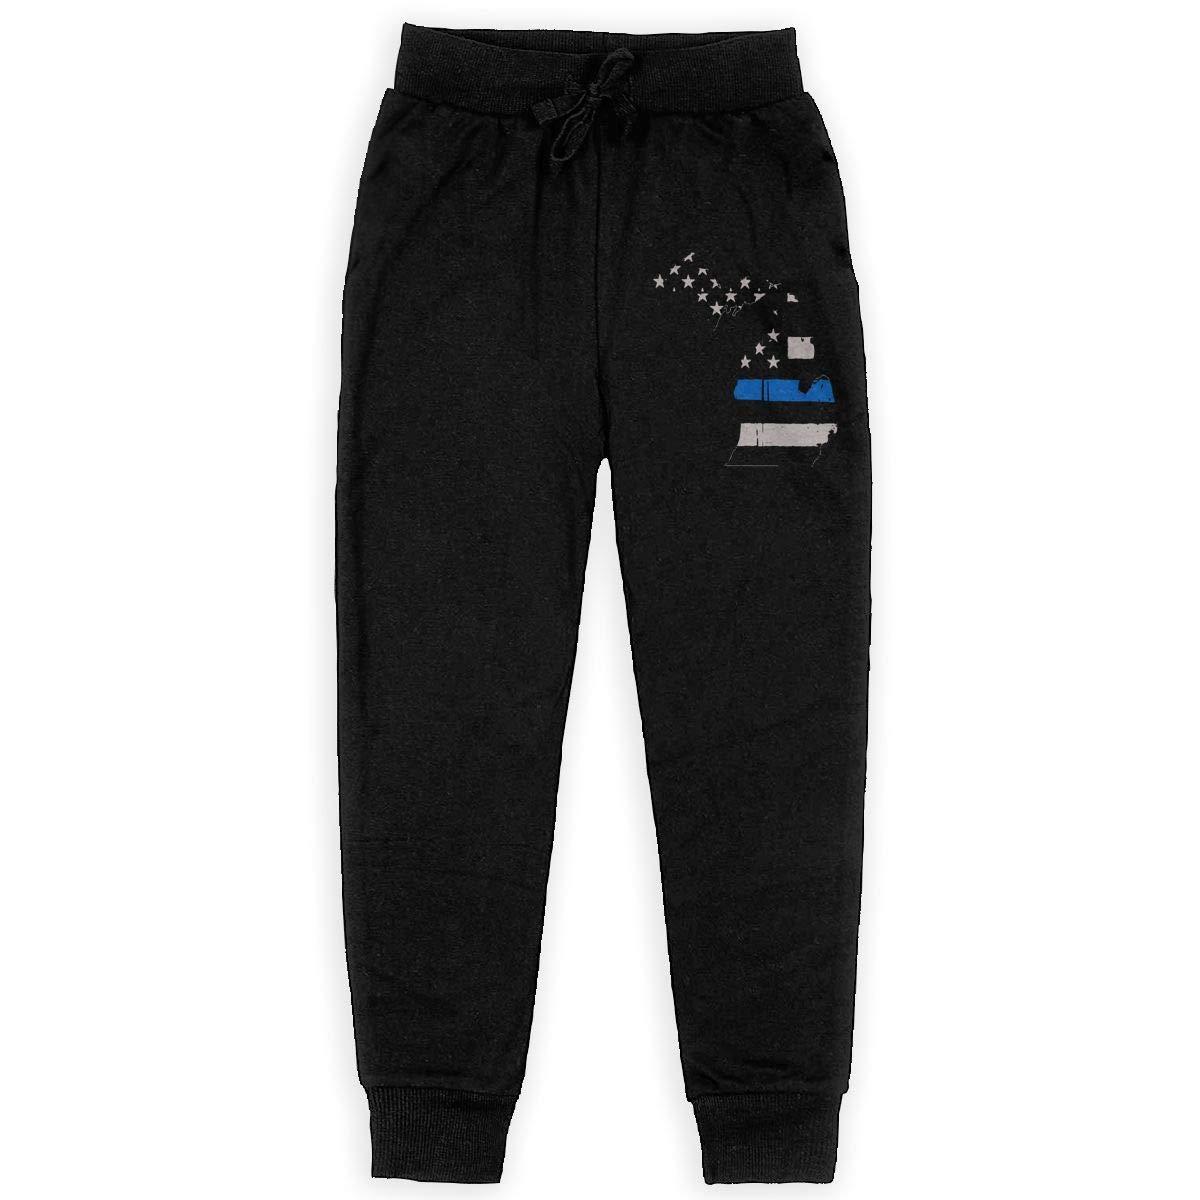 MAOYI/&J6 Michigan State Thin Blue Line Long Sweatpants Teens Boys Girls Casual Pants with Drawstring